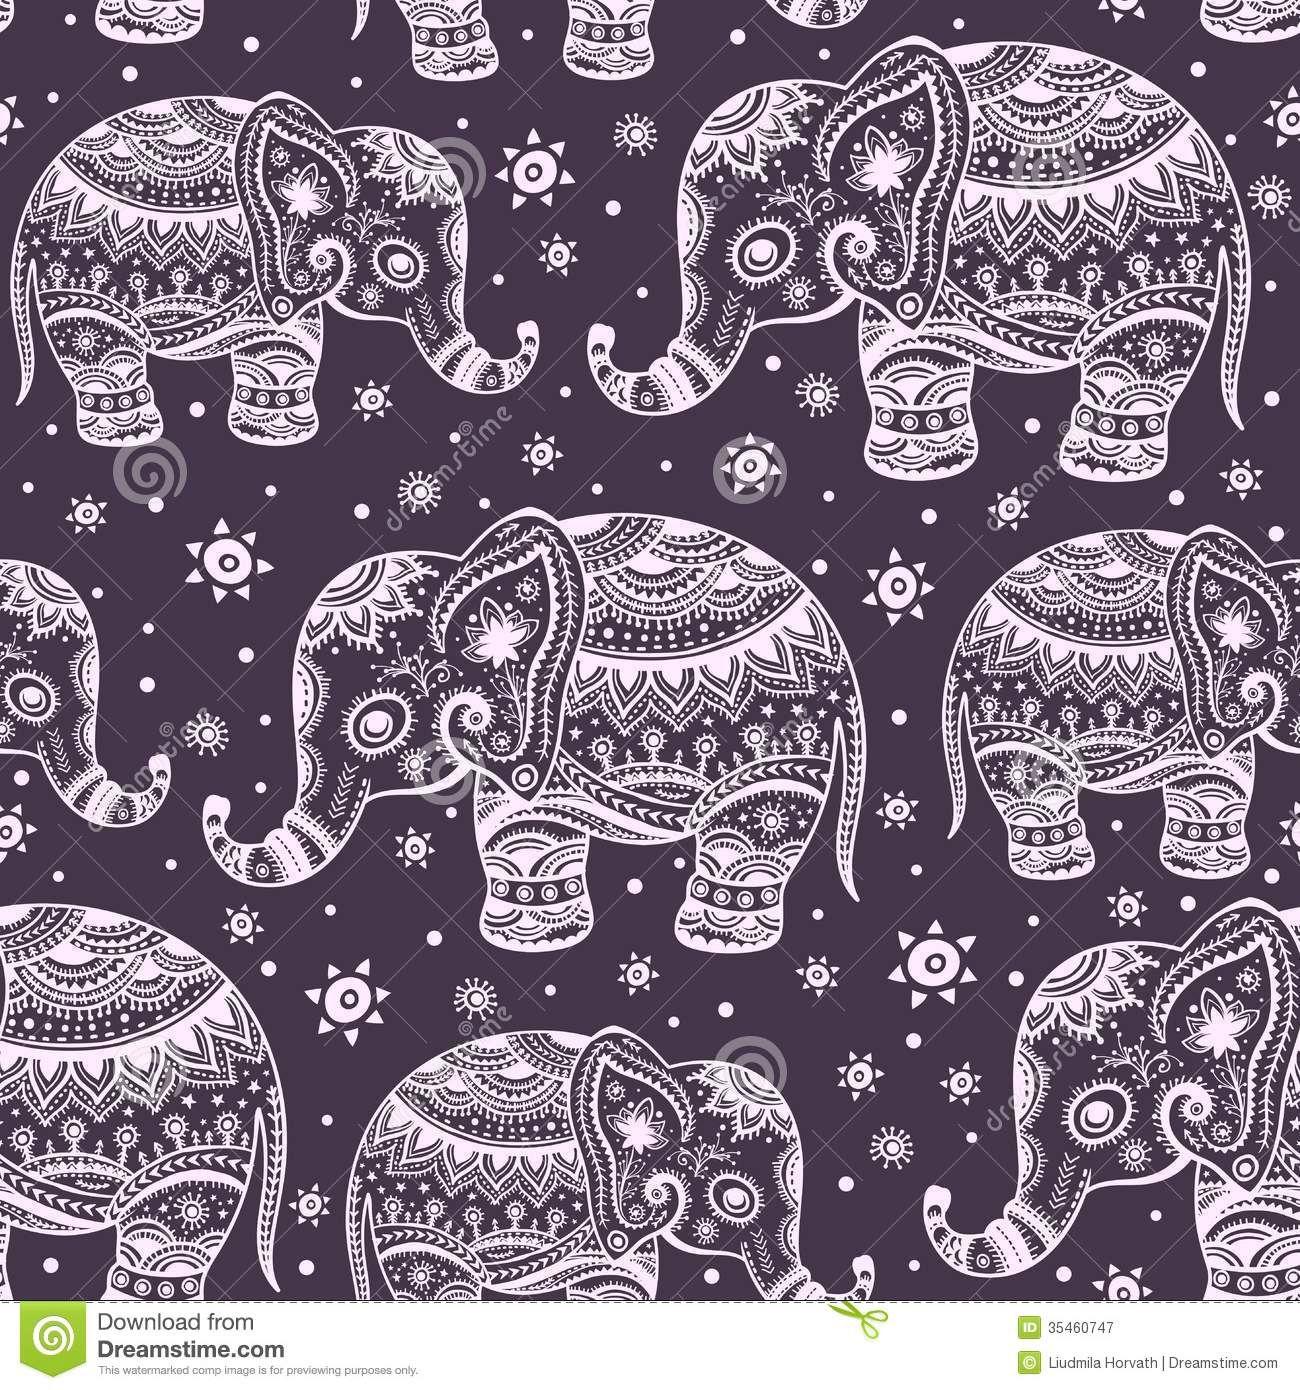 Tribal iphone wallpaper tumblr - Tribal Elephant Wallpaper Tribal Elephant Wallpaper